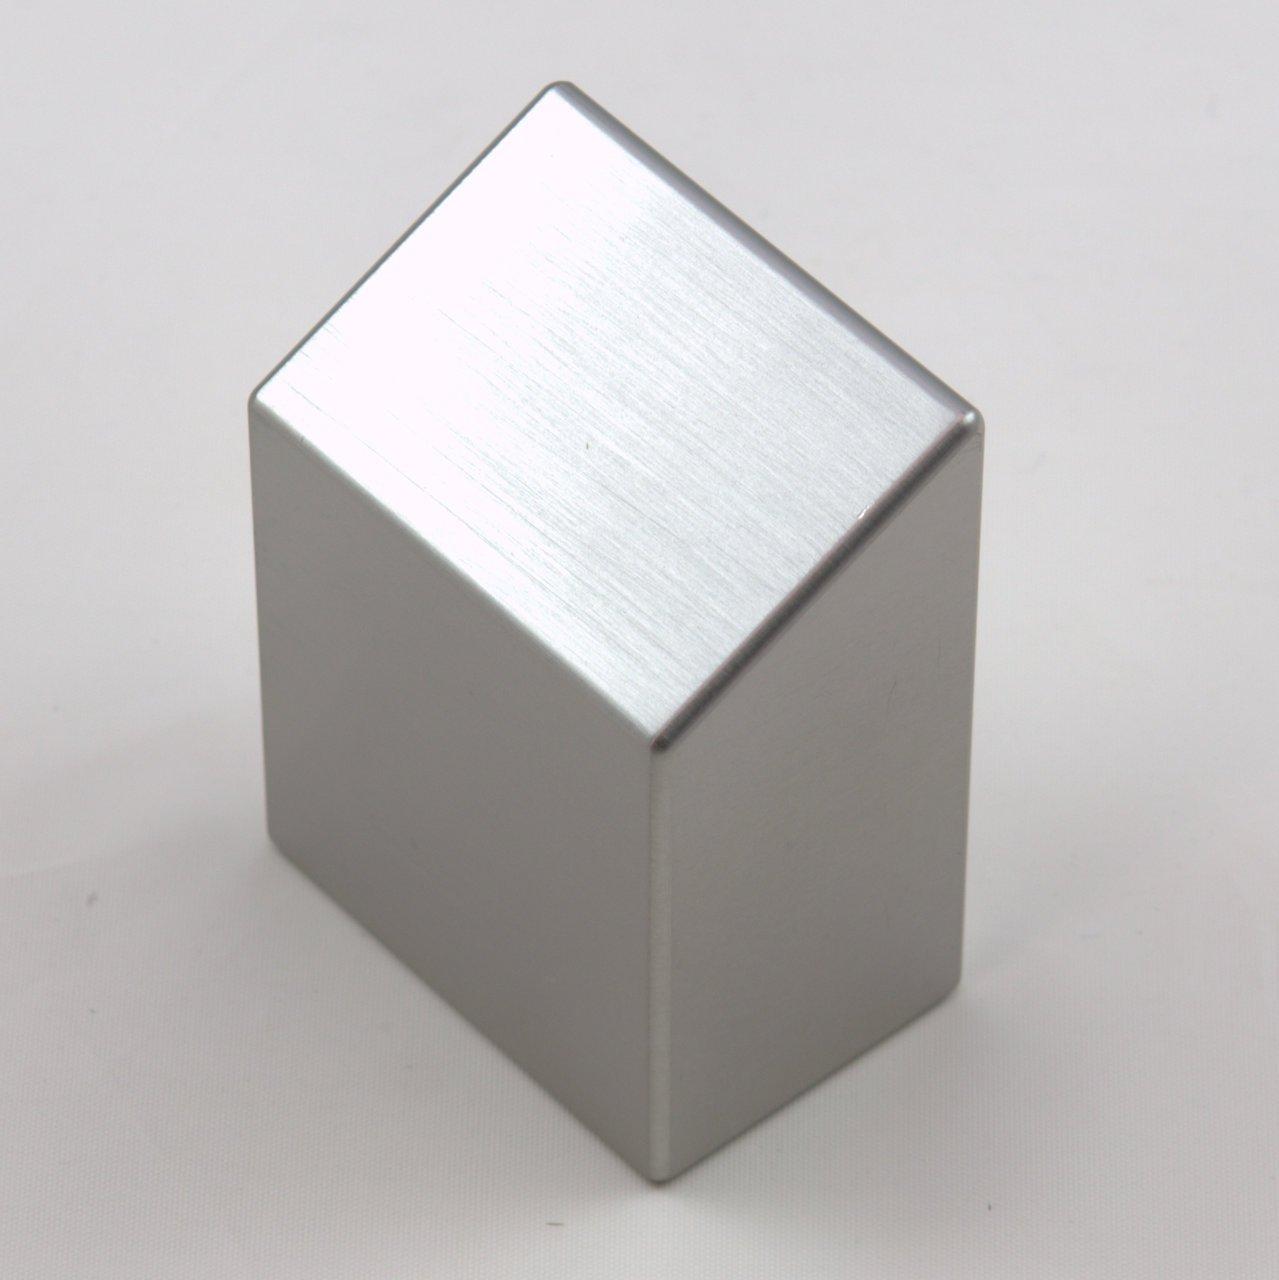 Tungsten Ergonomic Bucking Bar BB-16 1 x 1.5 x 2 1.76 lbs Angled Face